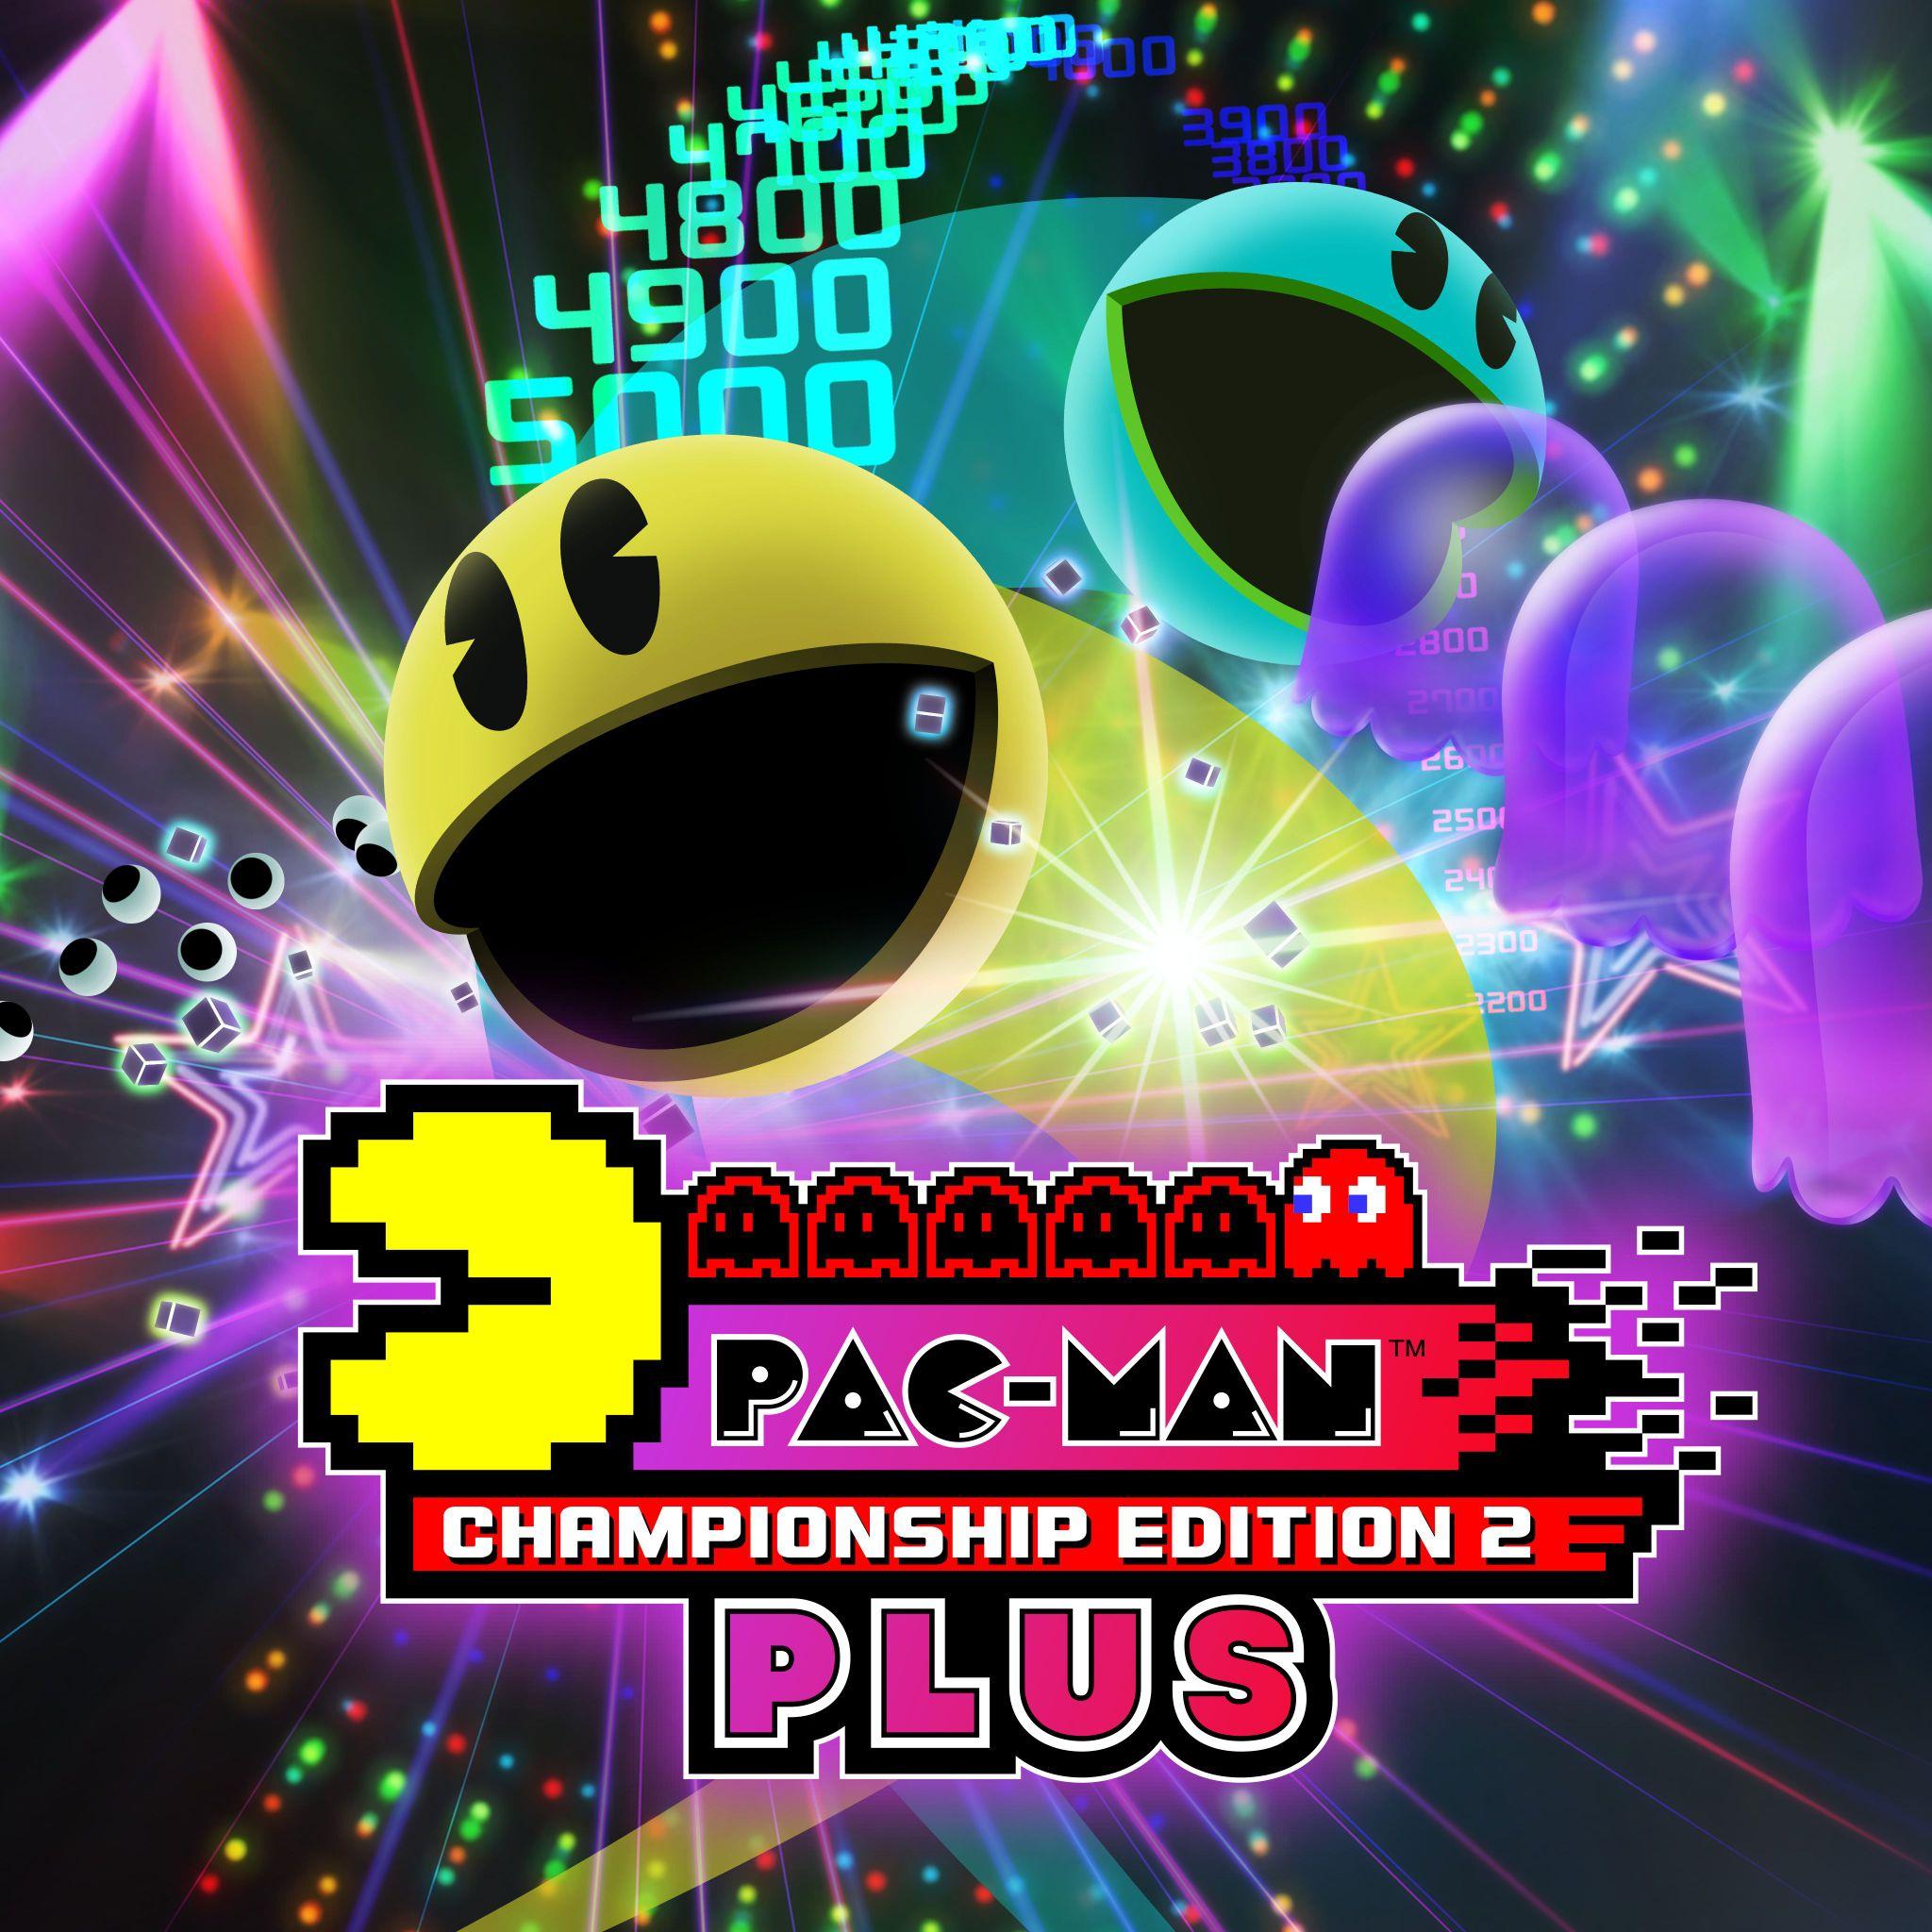 PAC-MAN™ CHAMPIONSHIP EDITION 2 PLUS